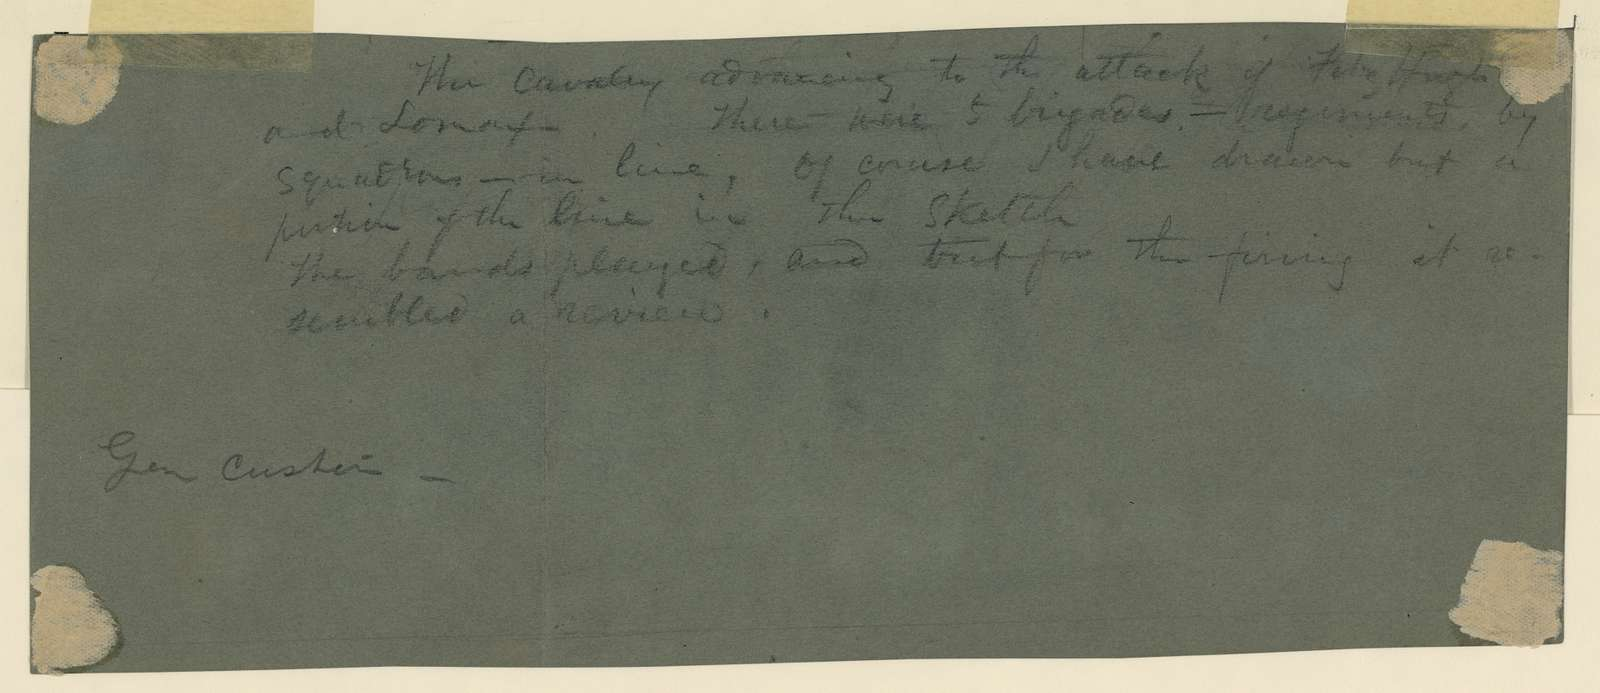 Battle of Winchester Sept 19 [?]